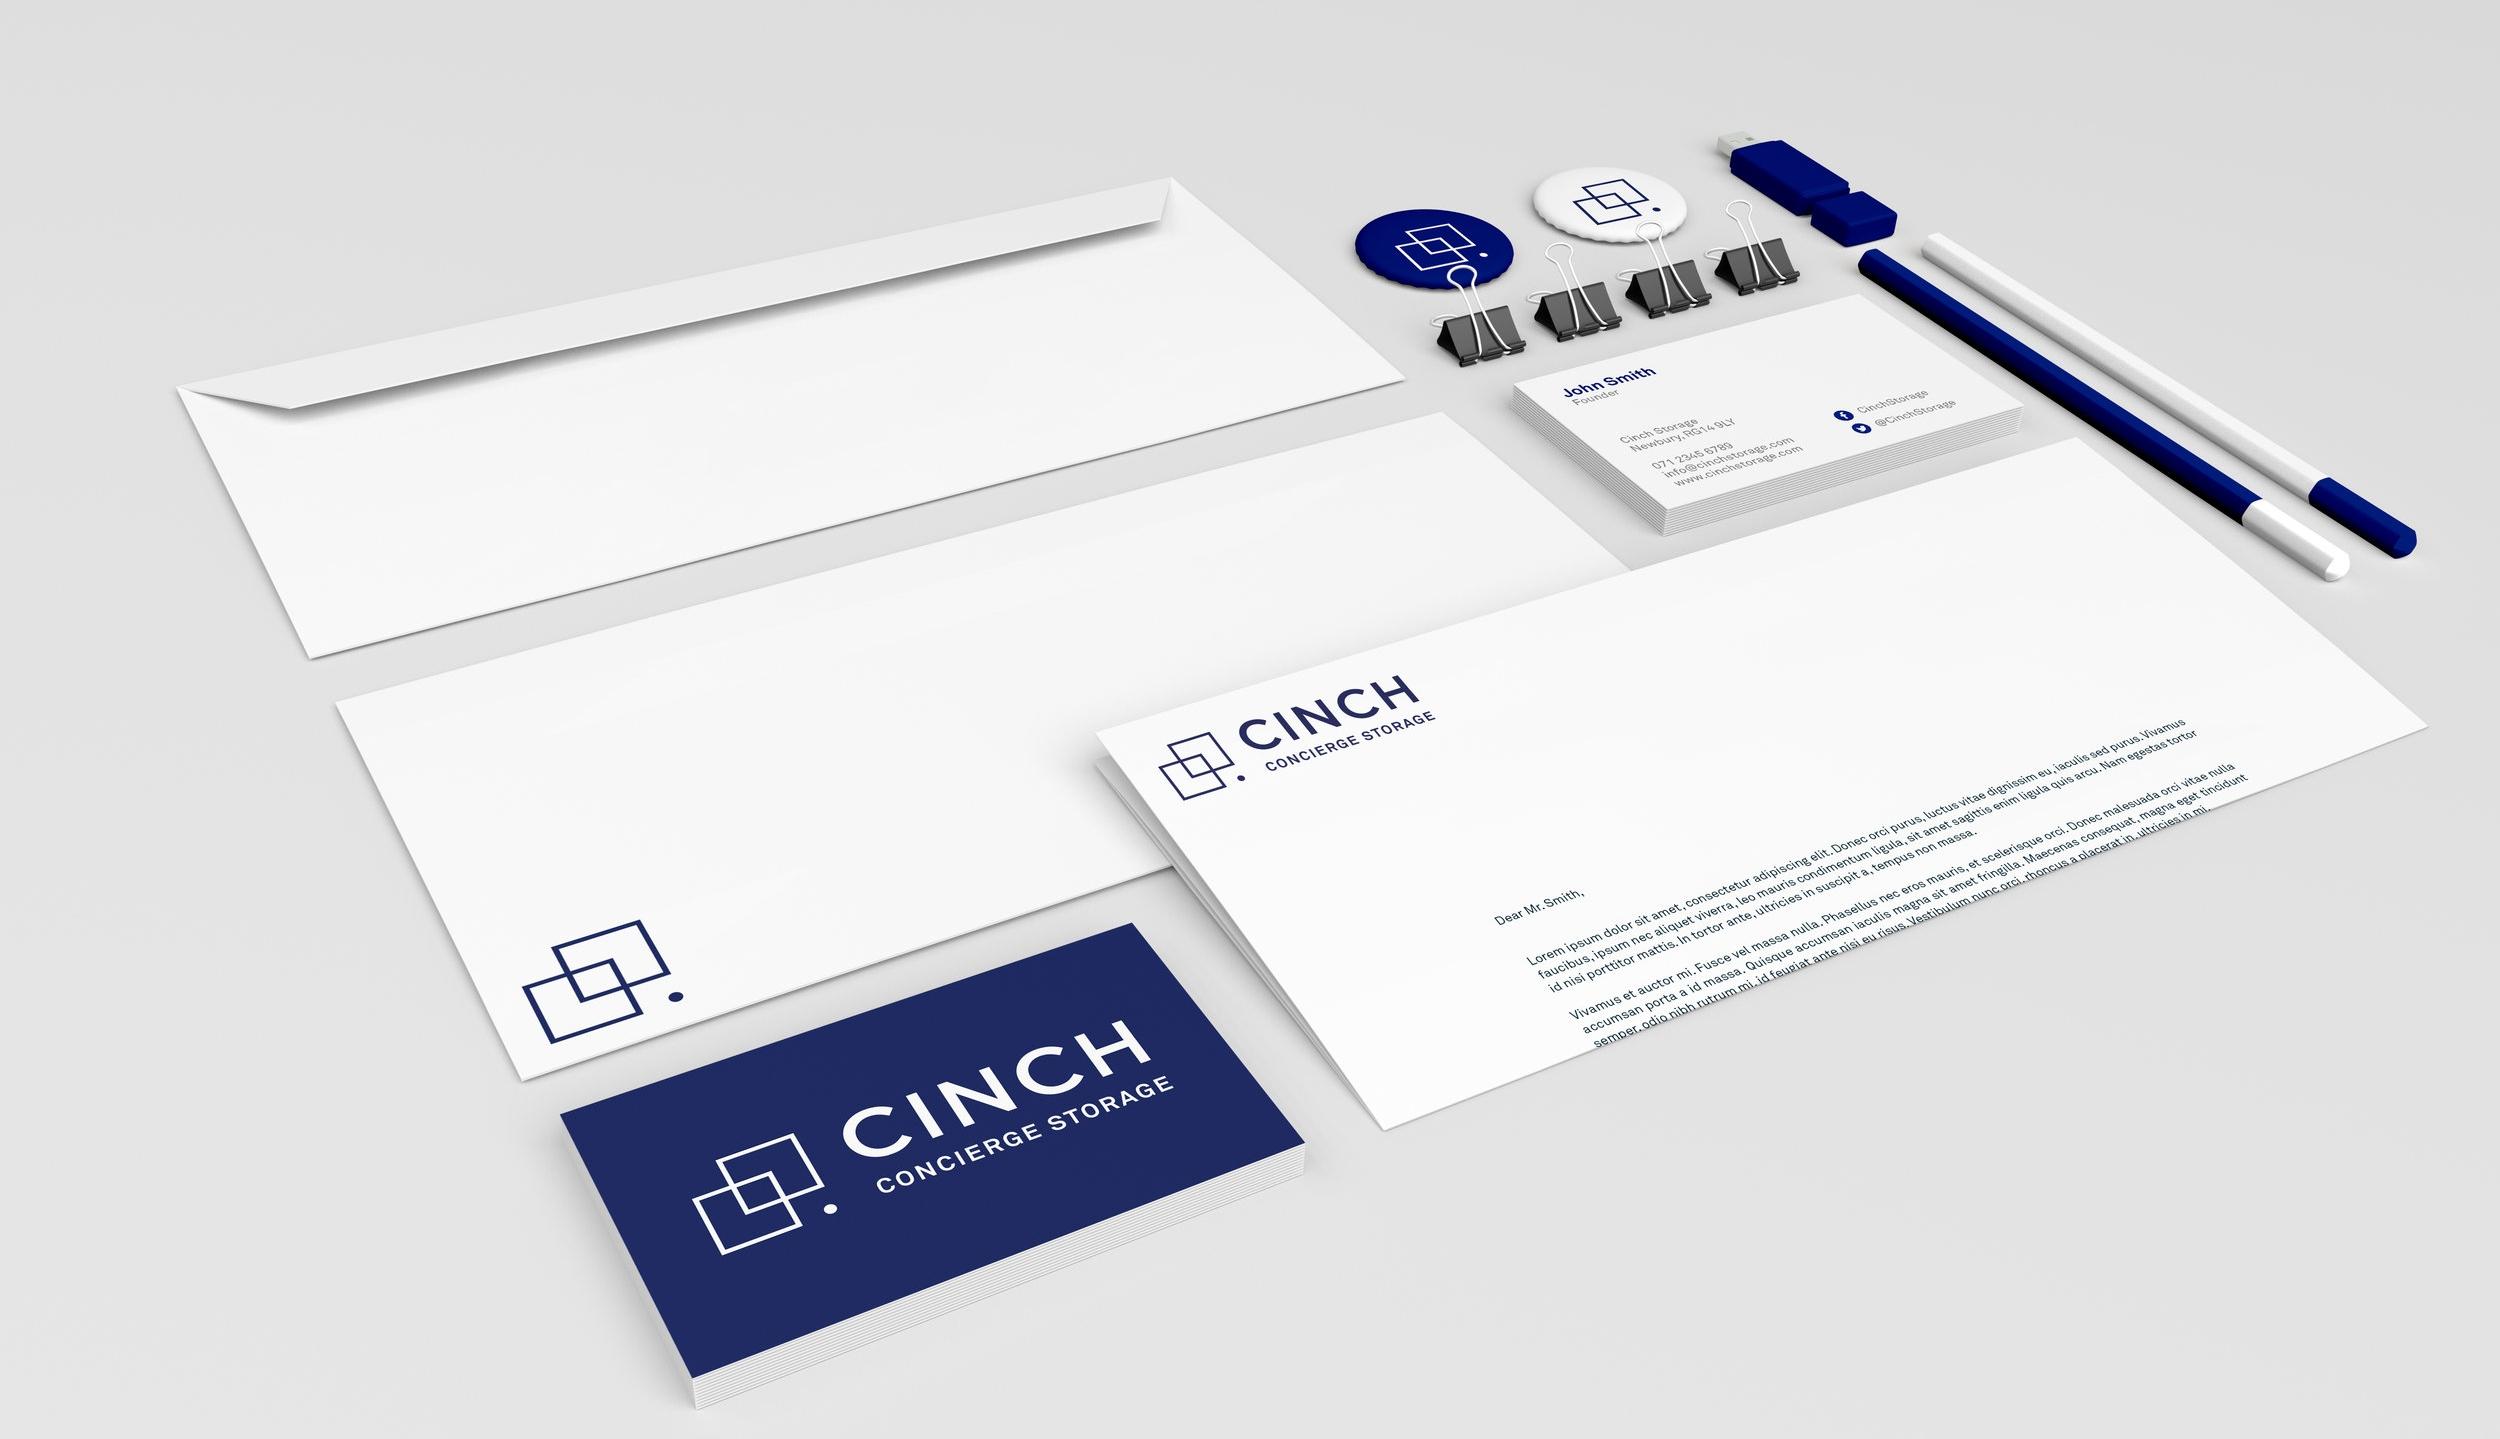 Bolter design brand and identity design for Cinch Concierge Storage